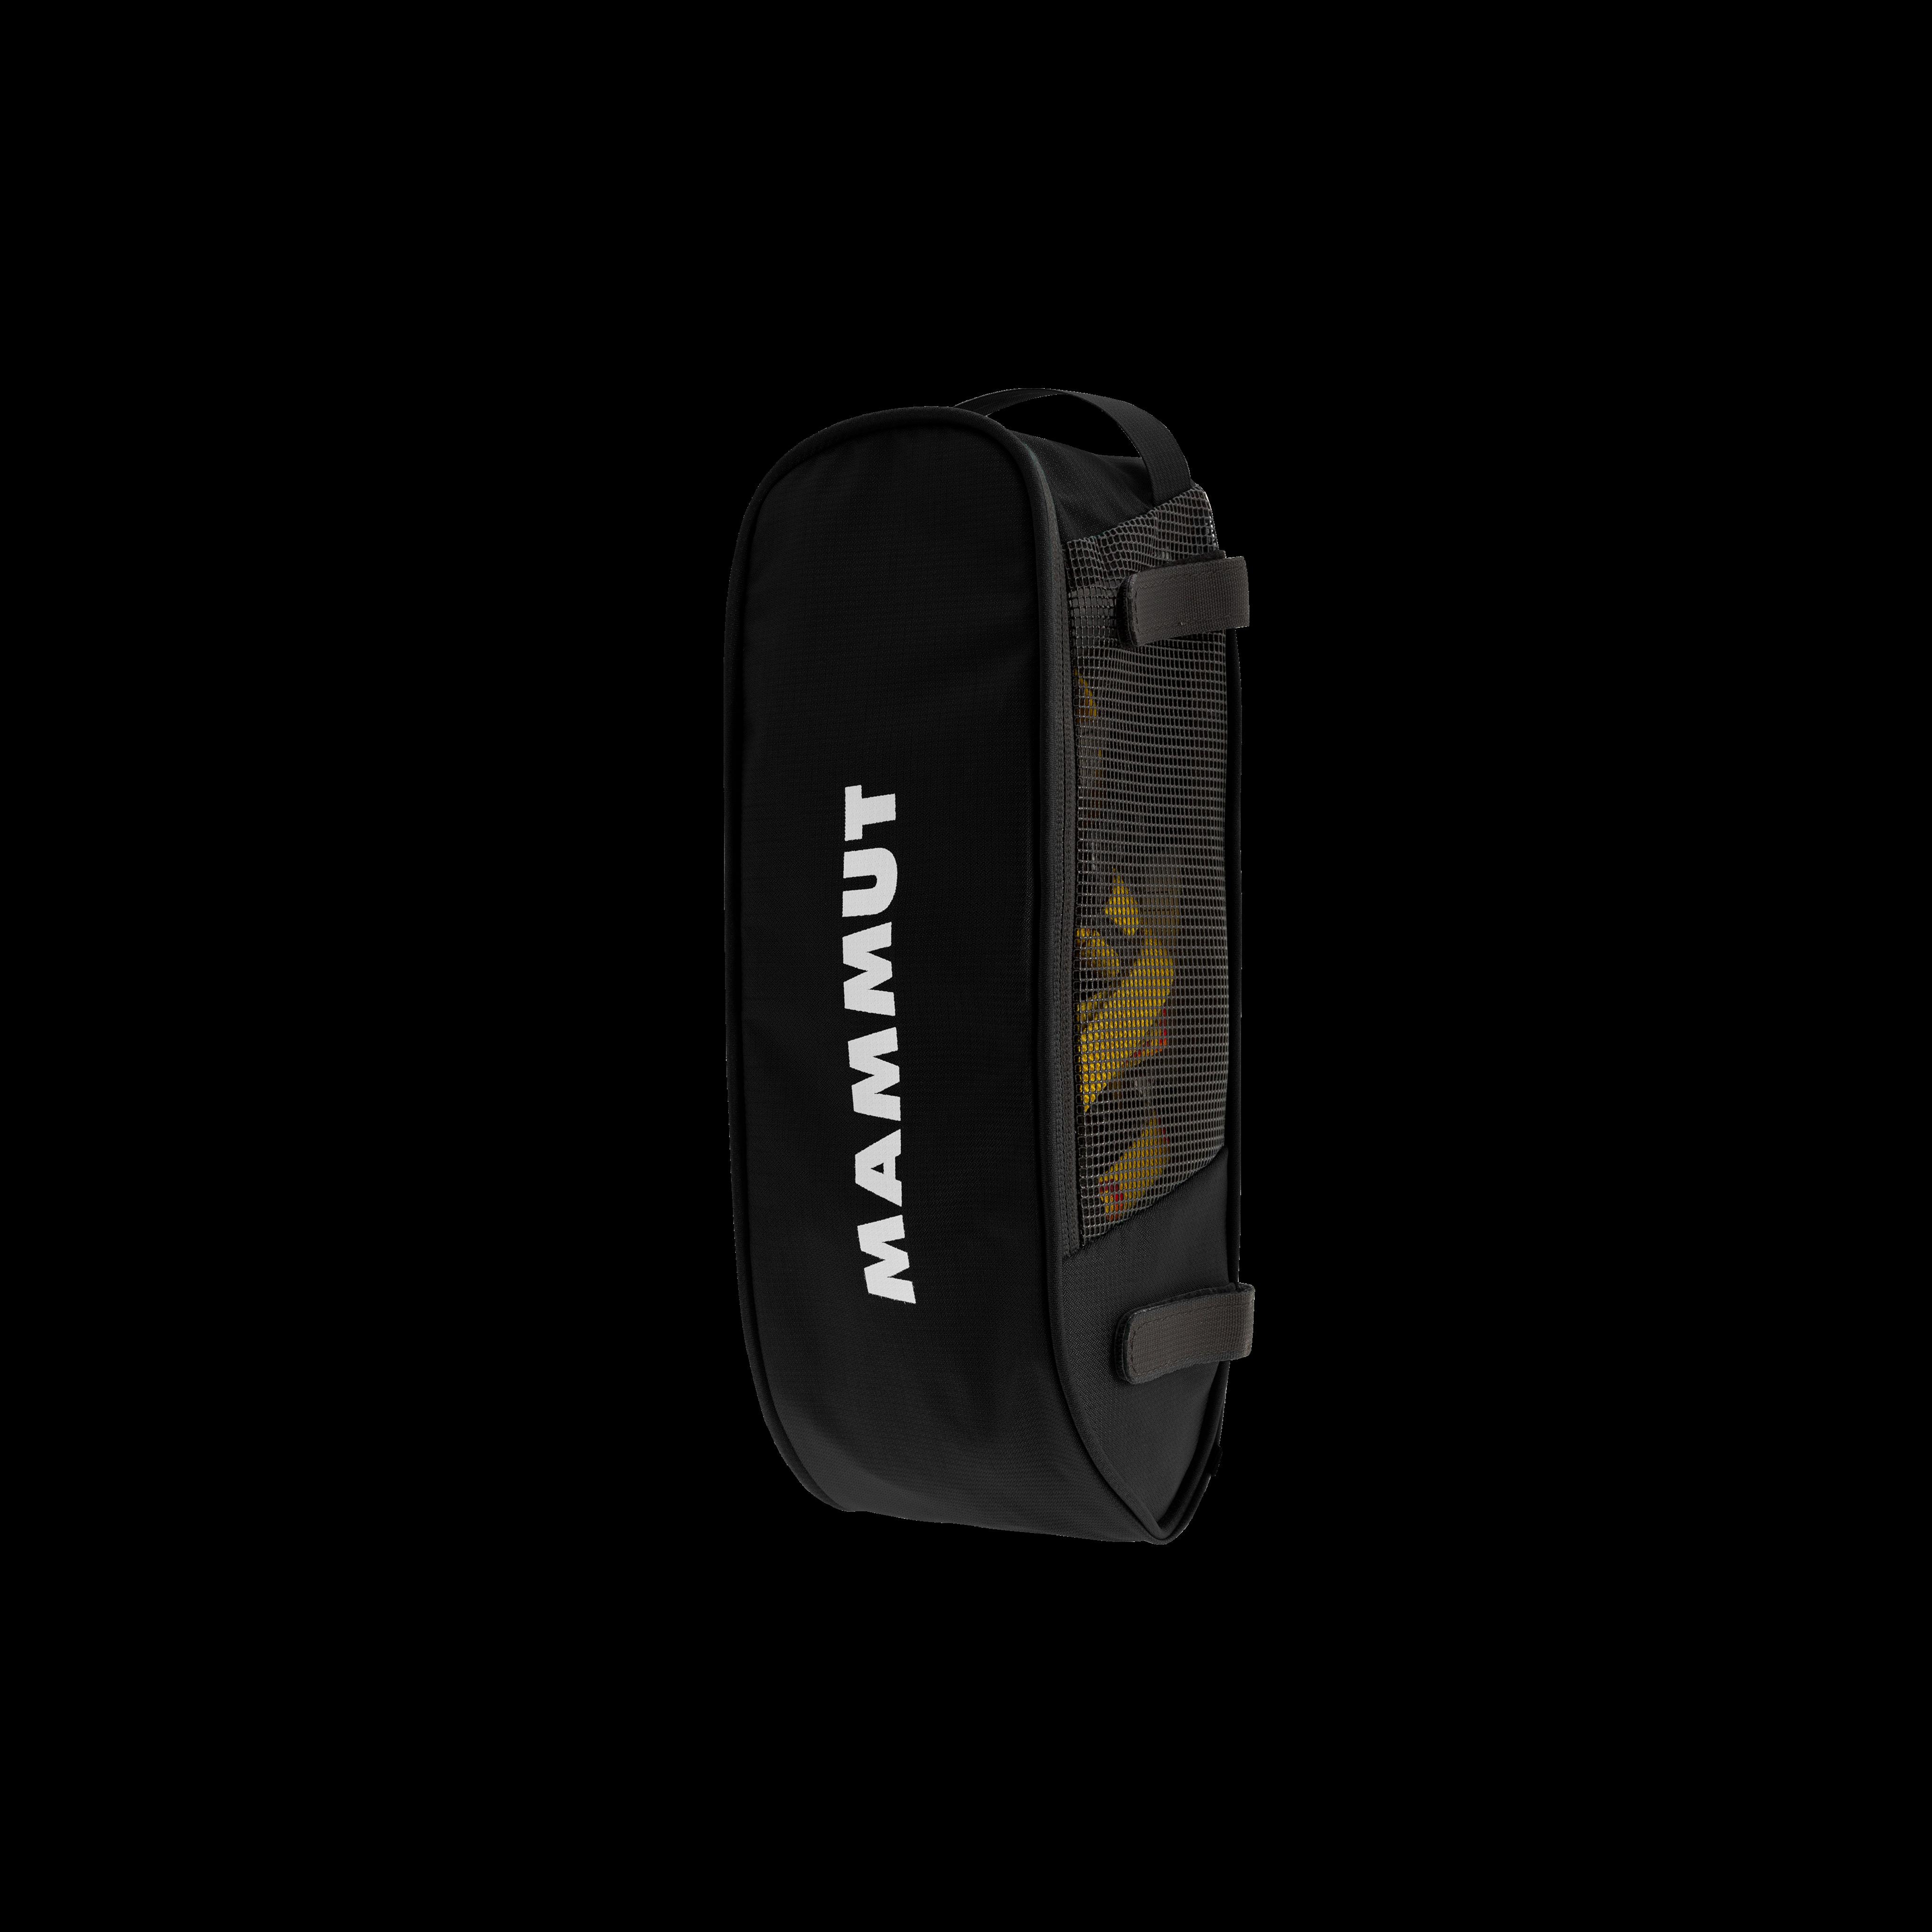 Crampon Pocket - black, one size thumbnail